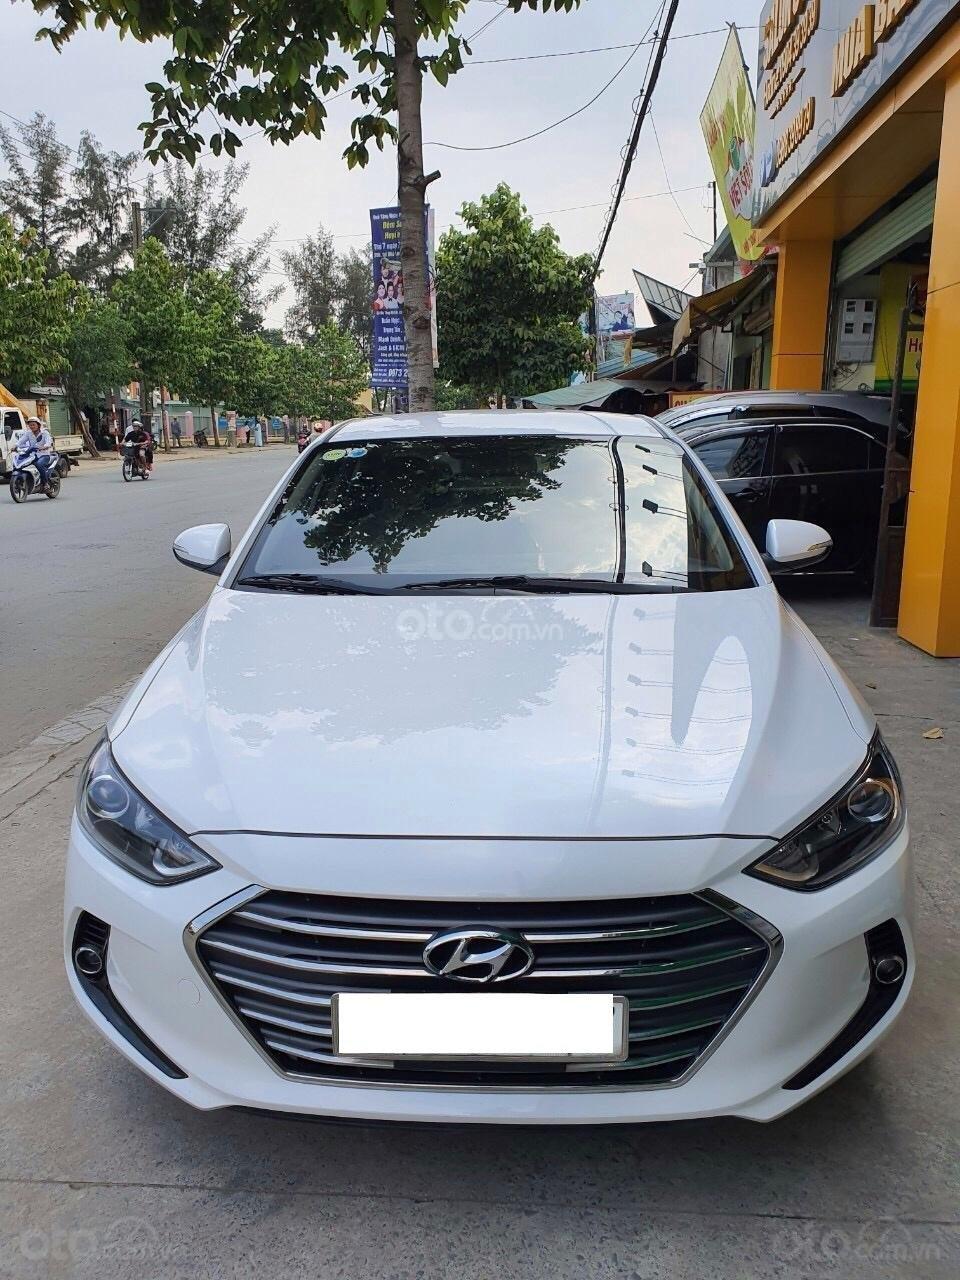 Hyundai Elantra 1.6 MT - 2016 (8)